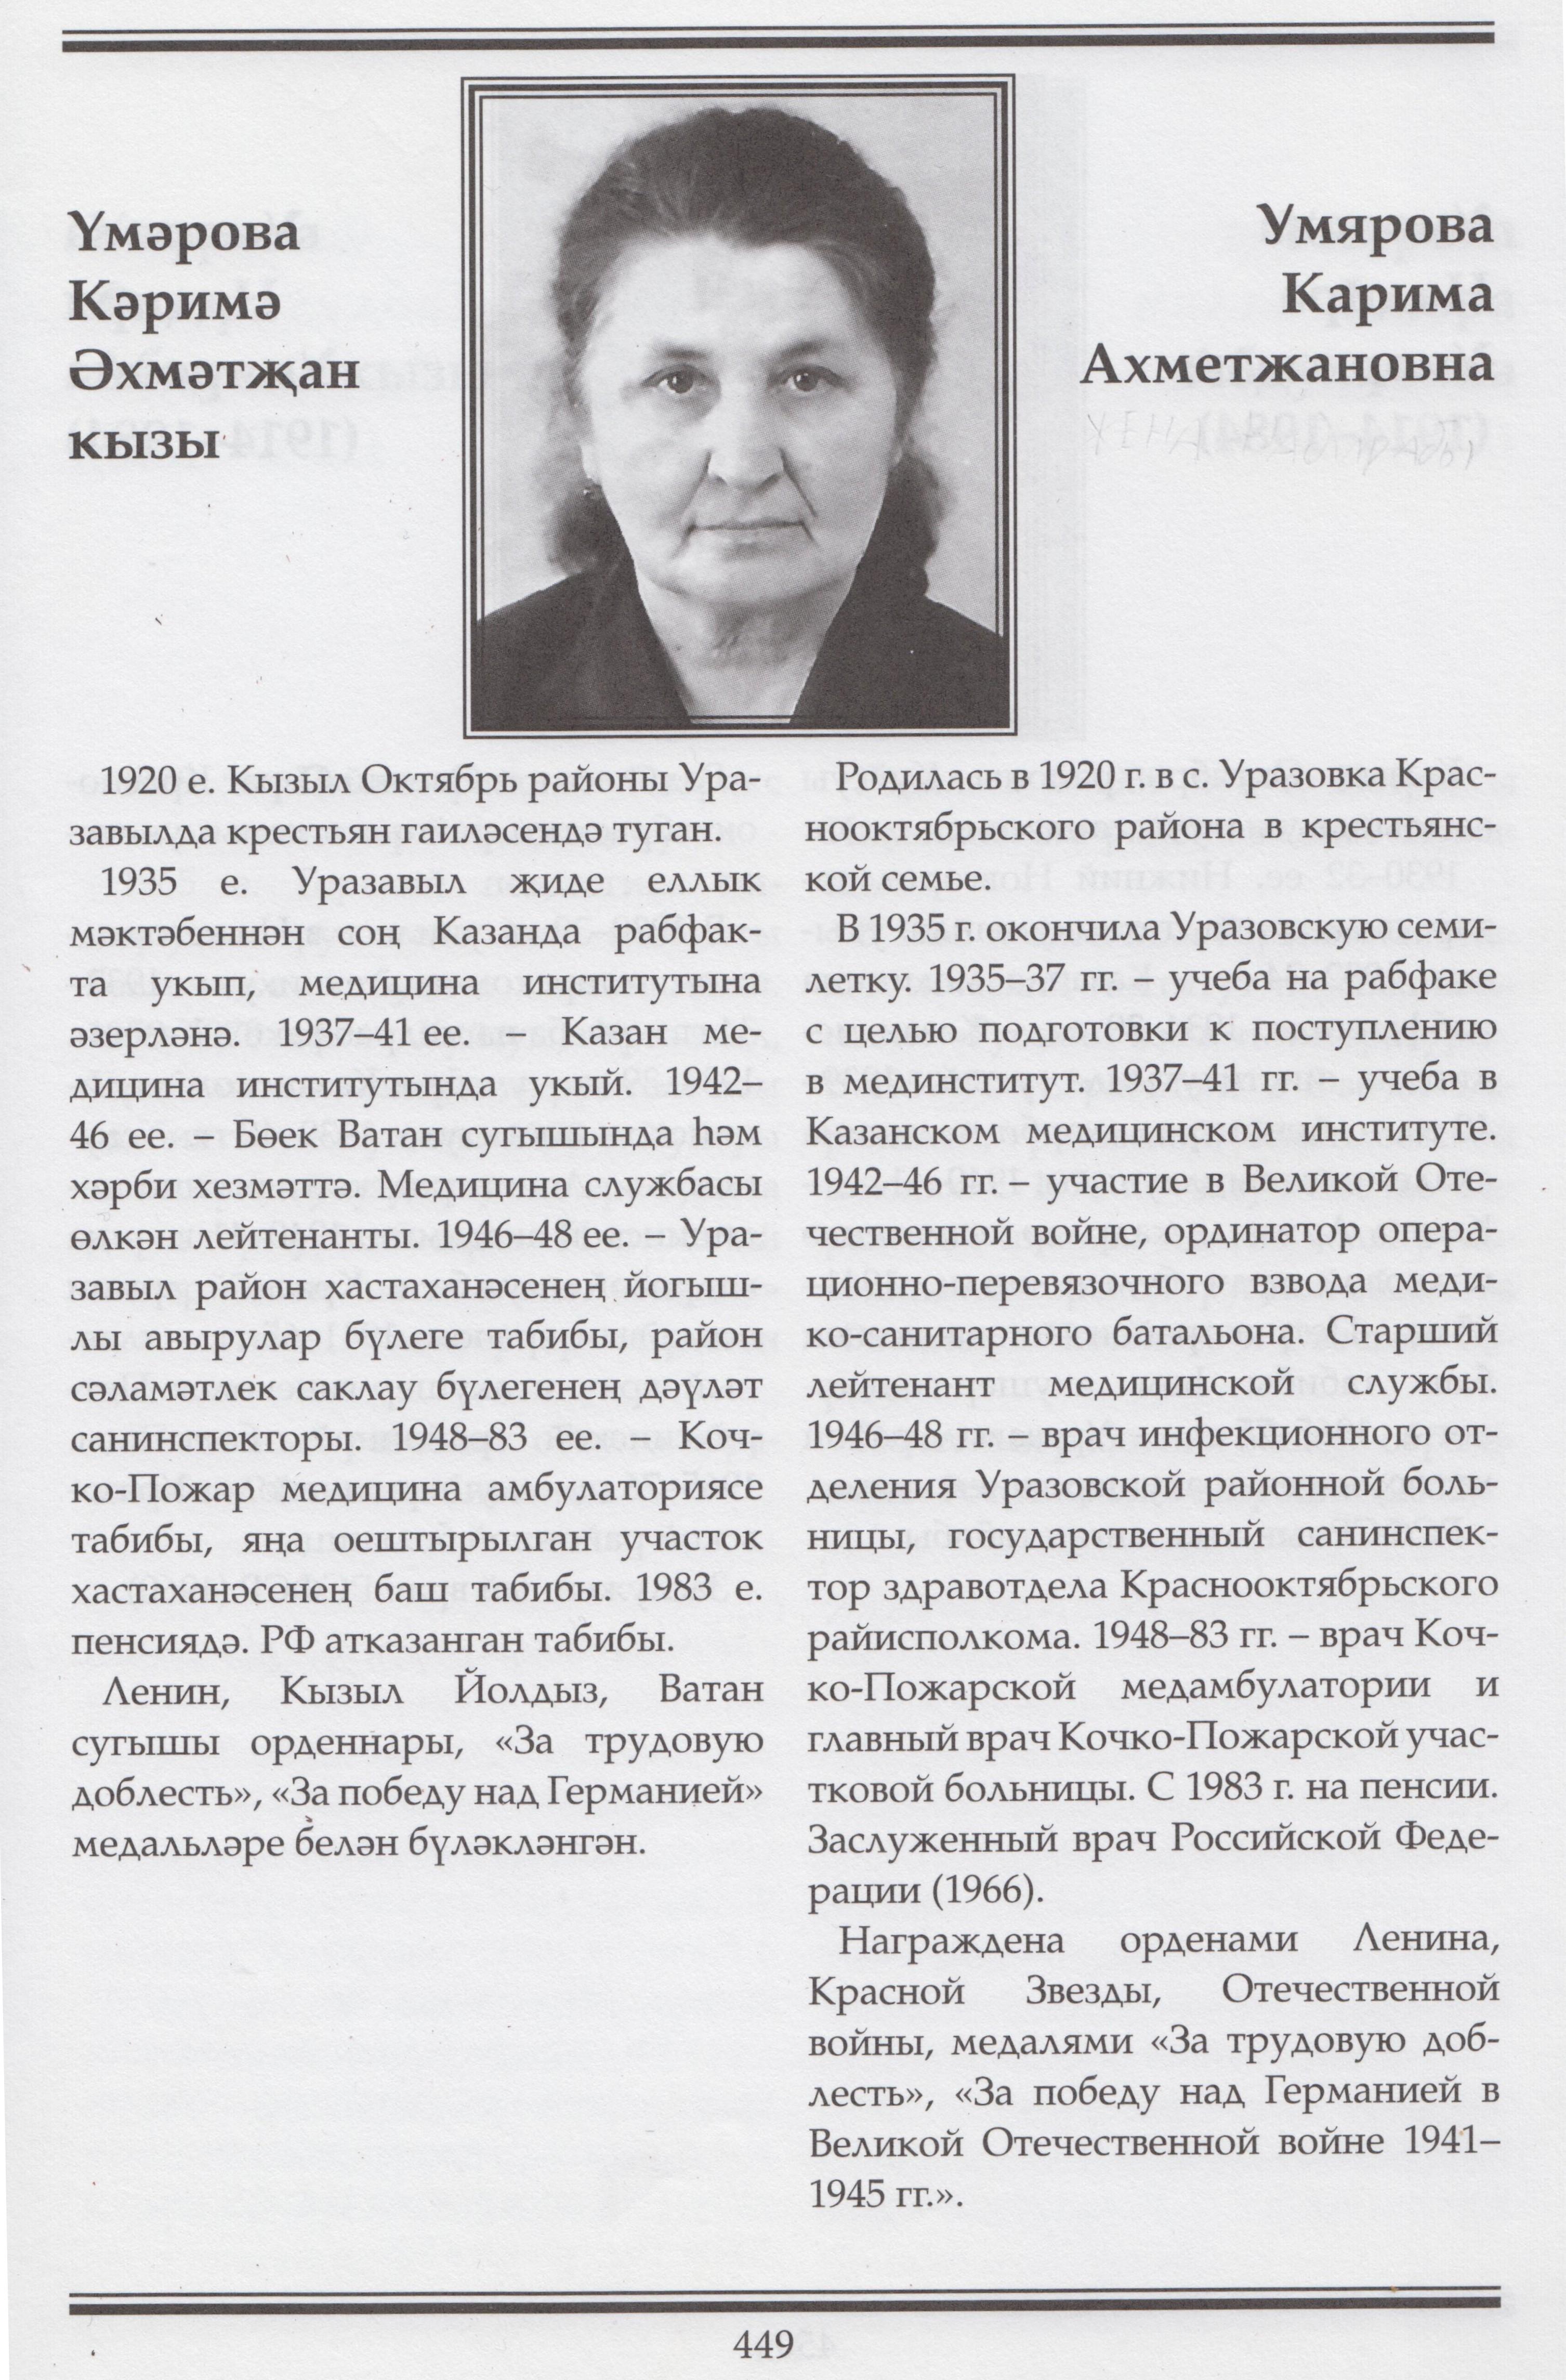 Умярова Карима Ахметжан улы